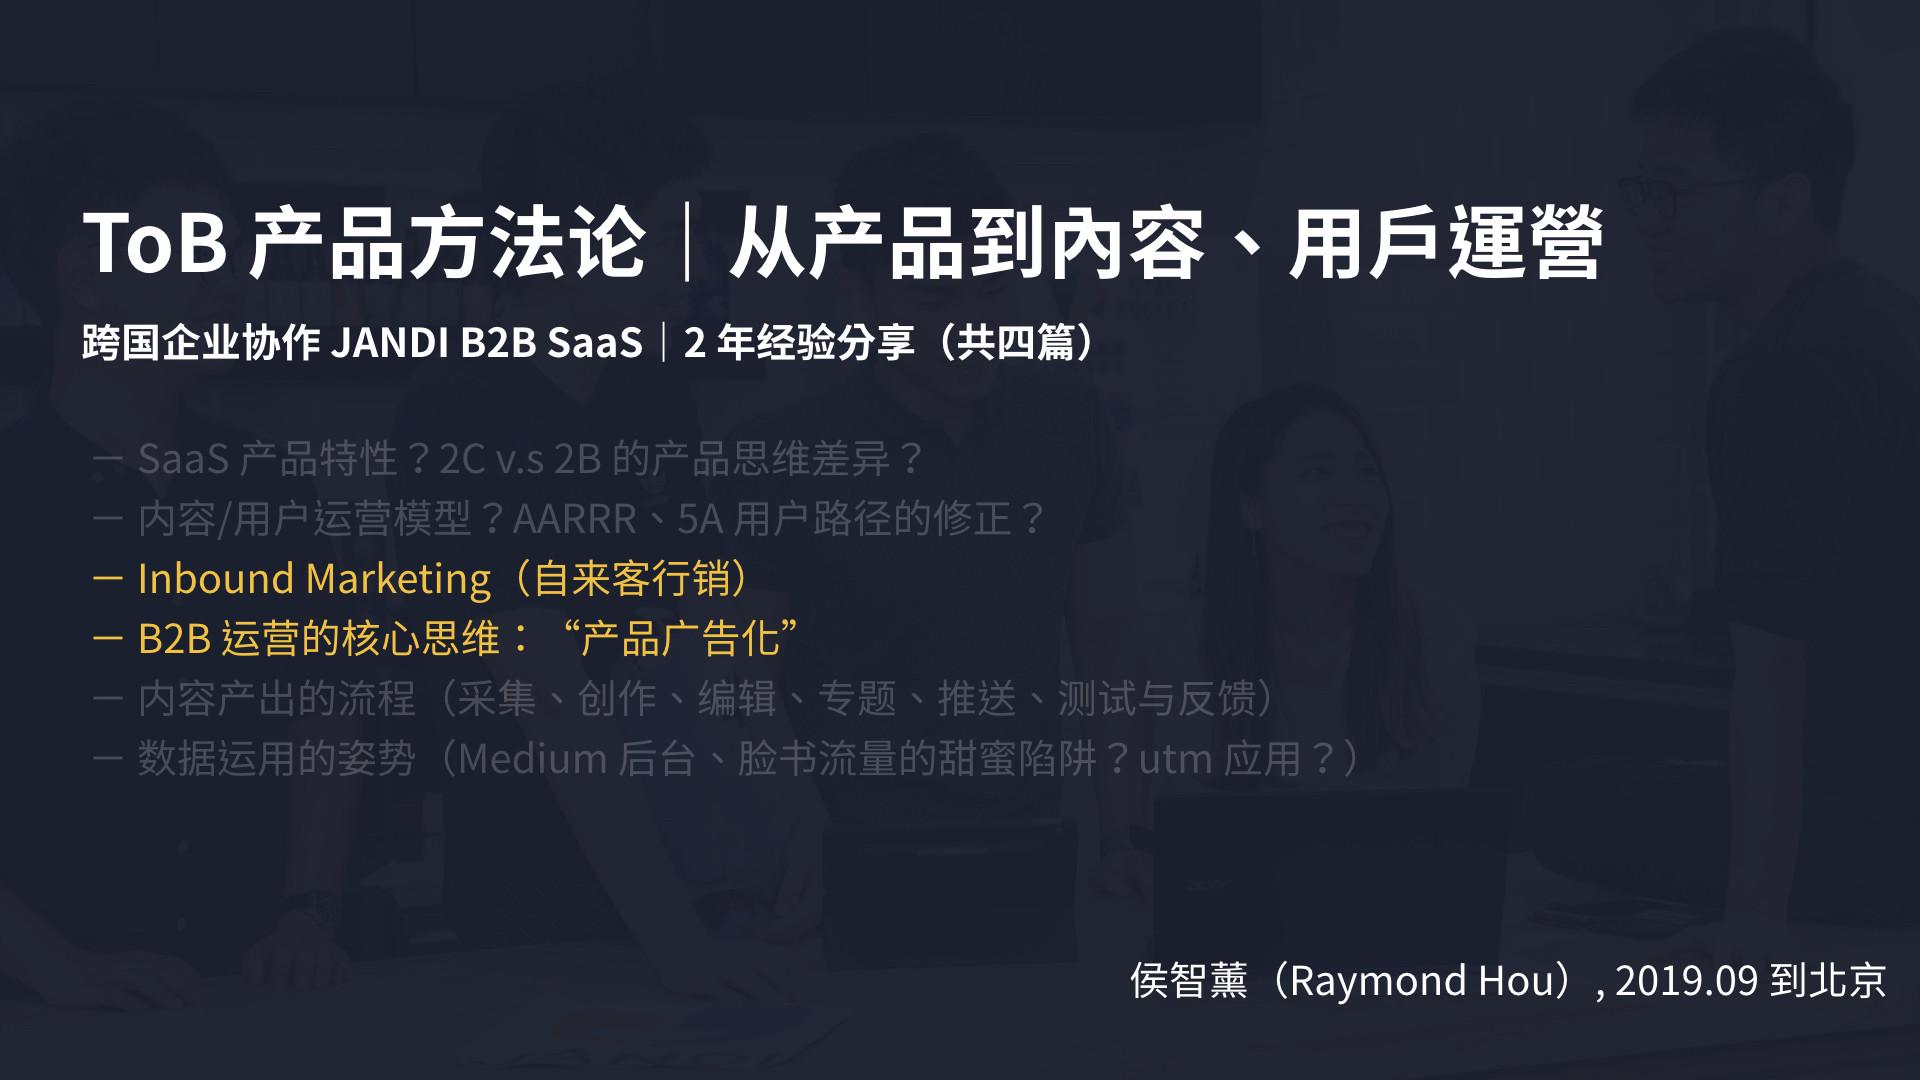 http://www.beaconitnl.com/keji/229431.html